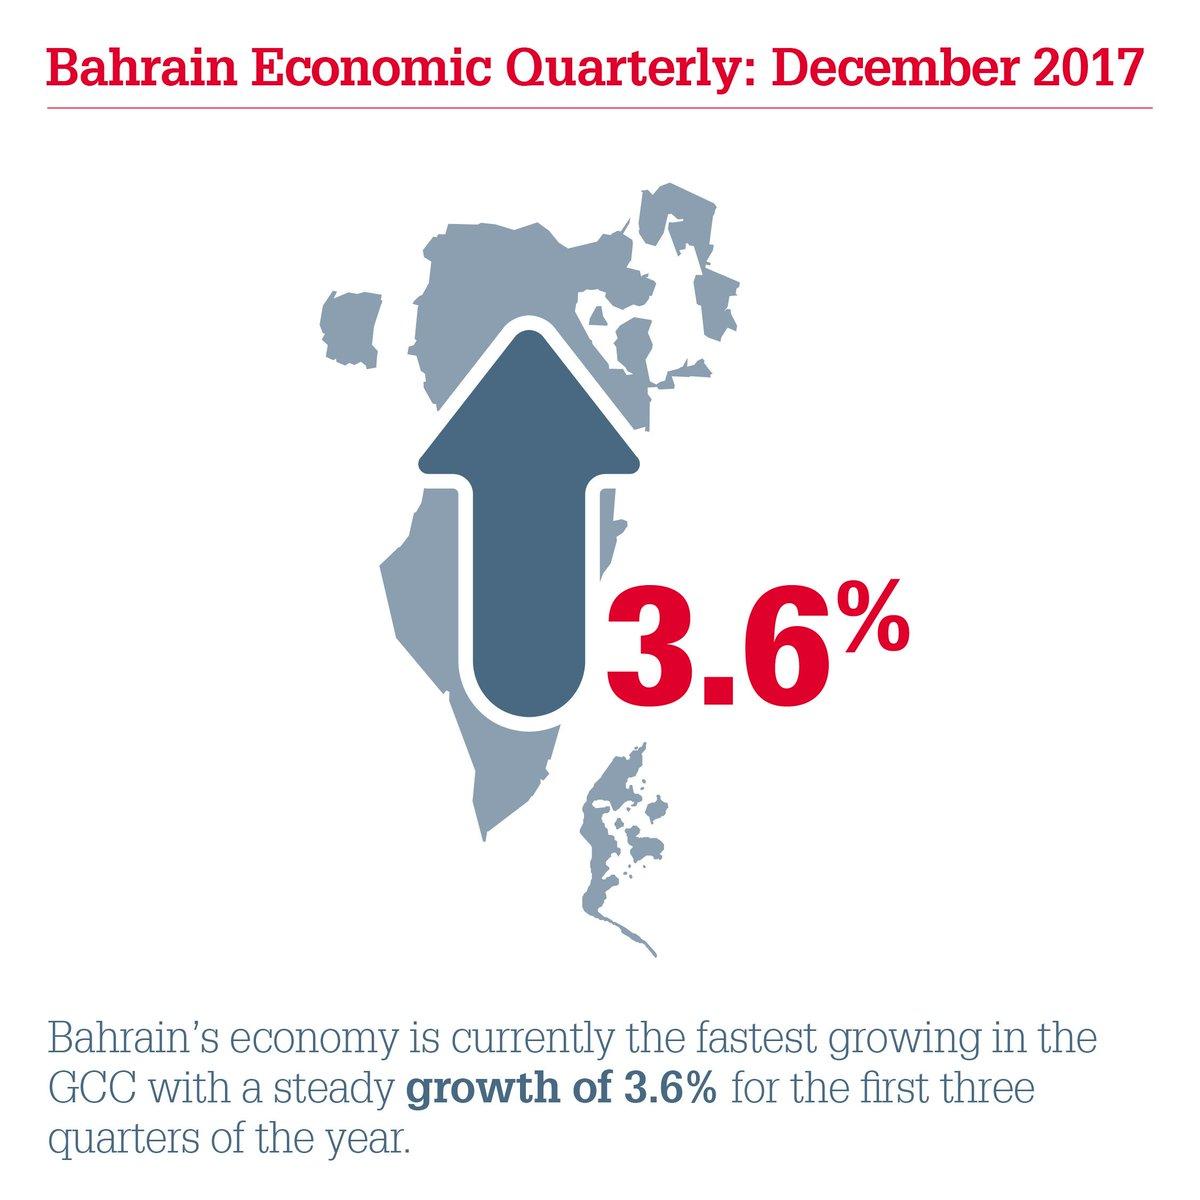 Bahrain EDB on Twitter: